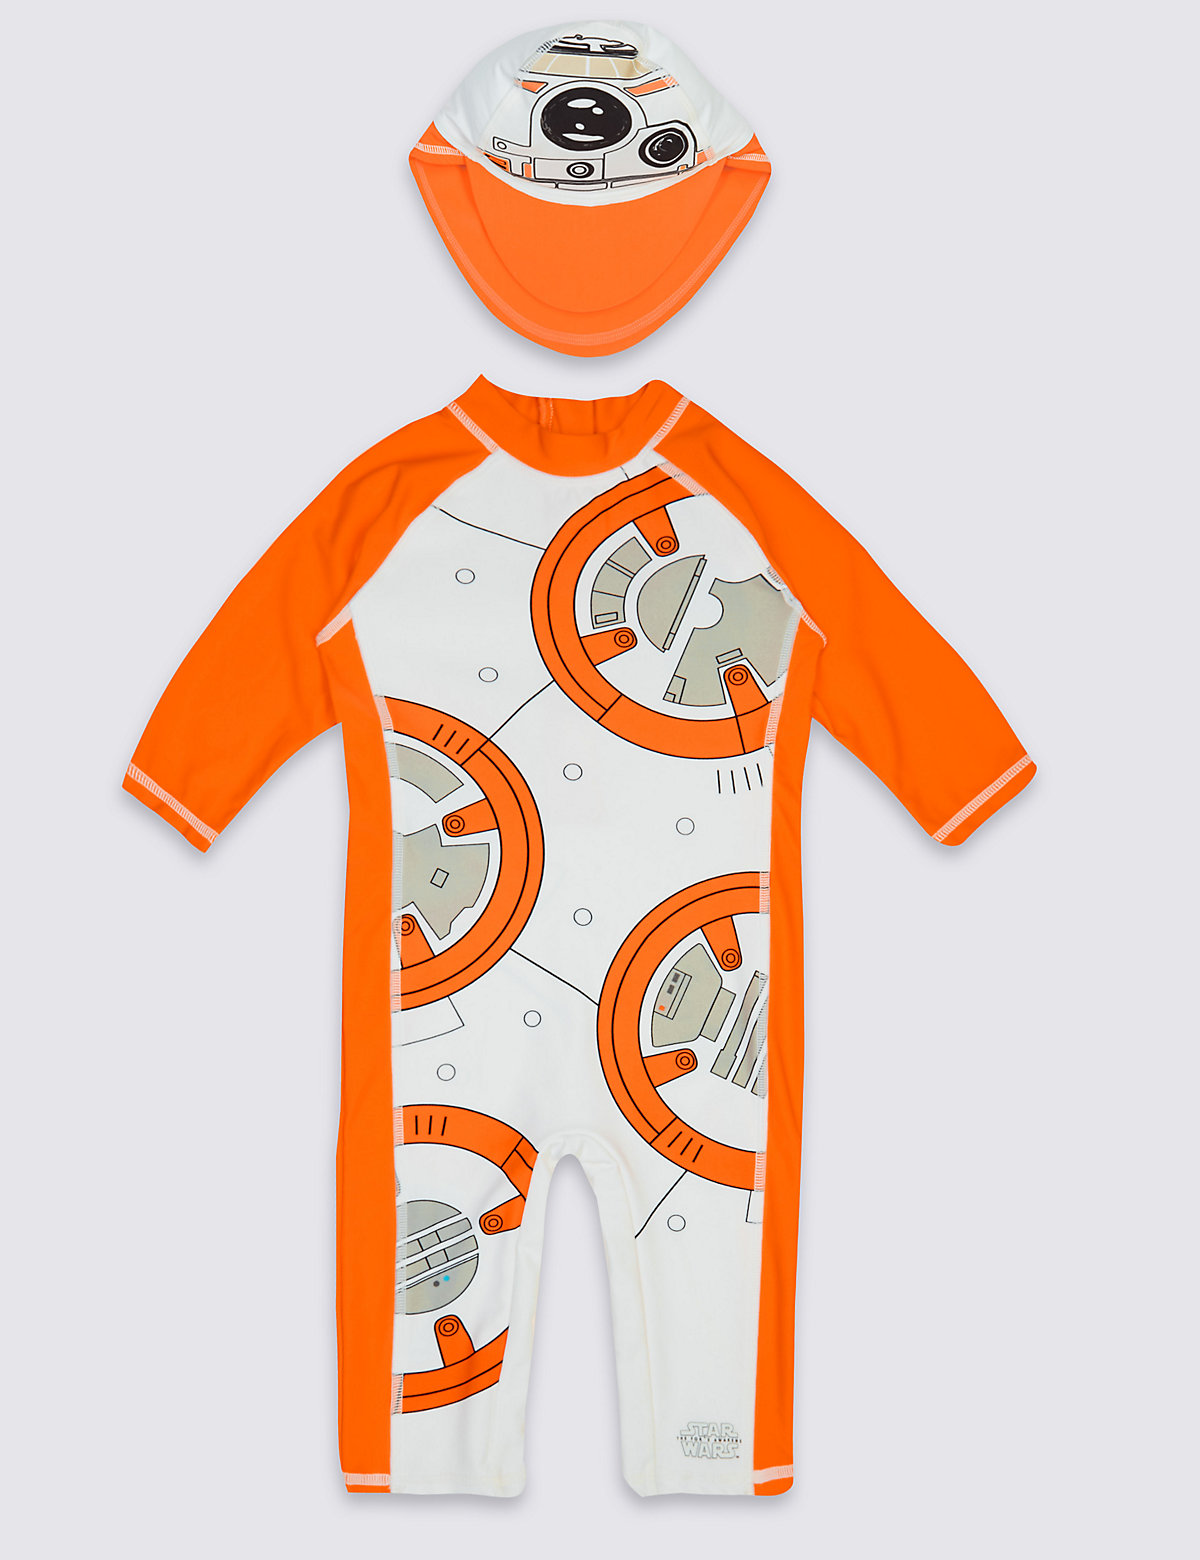 2 Piece Star Wars Swim Outfit (0-5 Years)